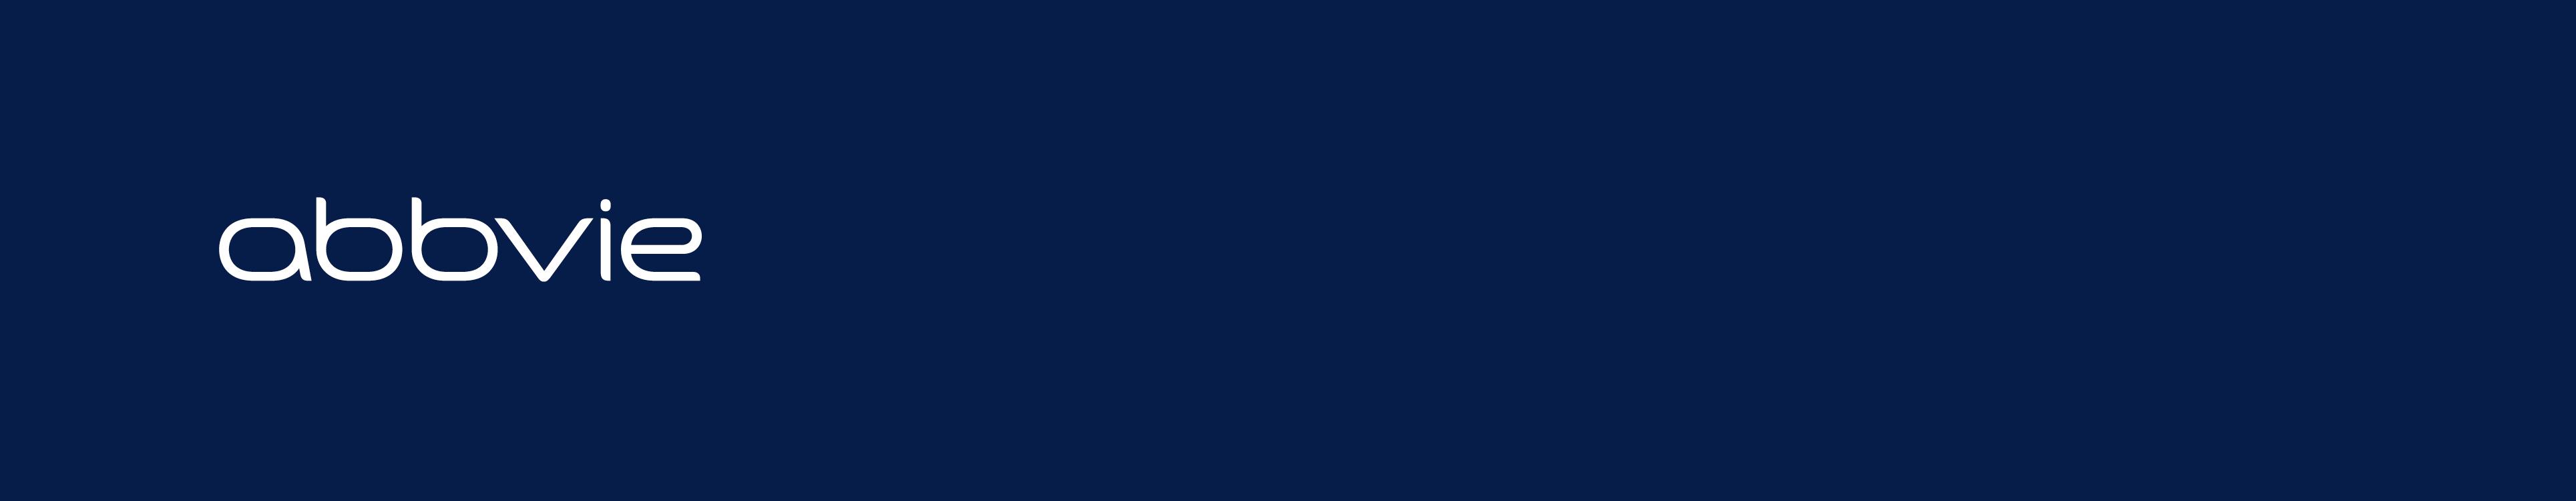 Electus 2020 - Expertenkurs Entzündungsdermatologie virtuell